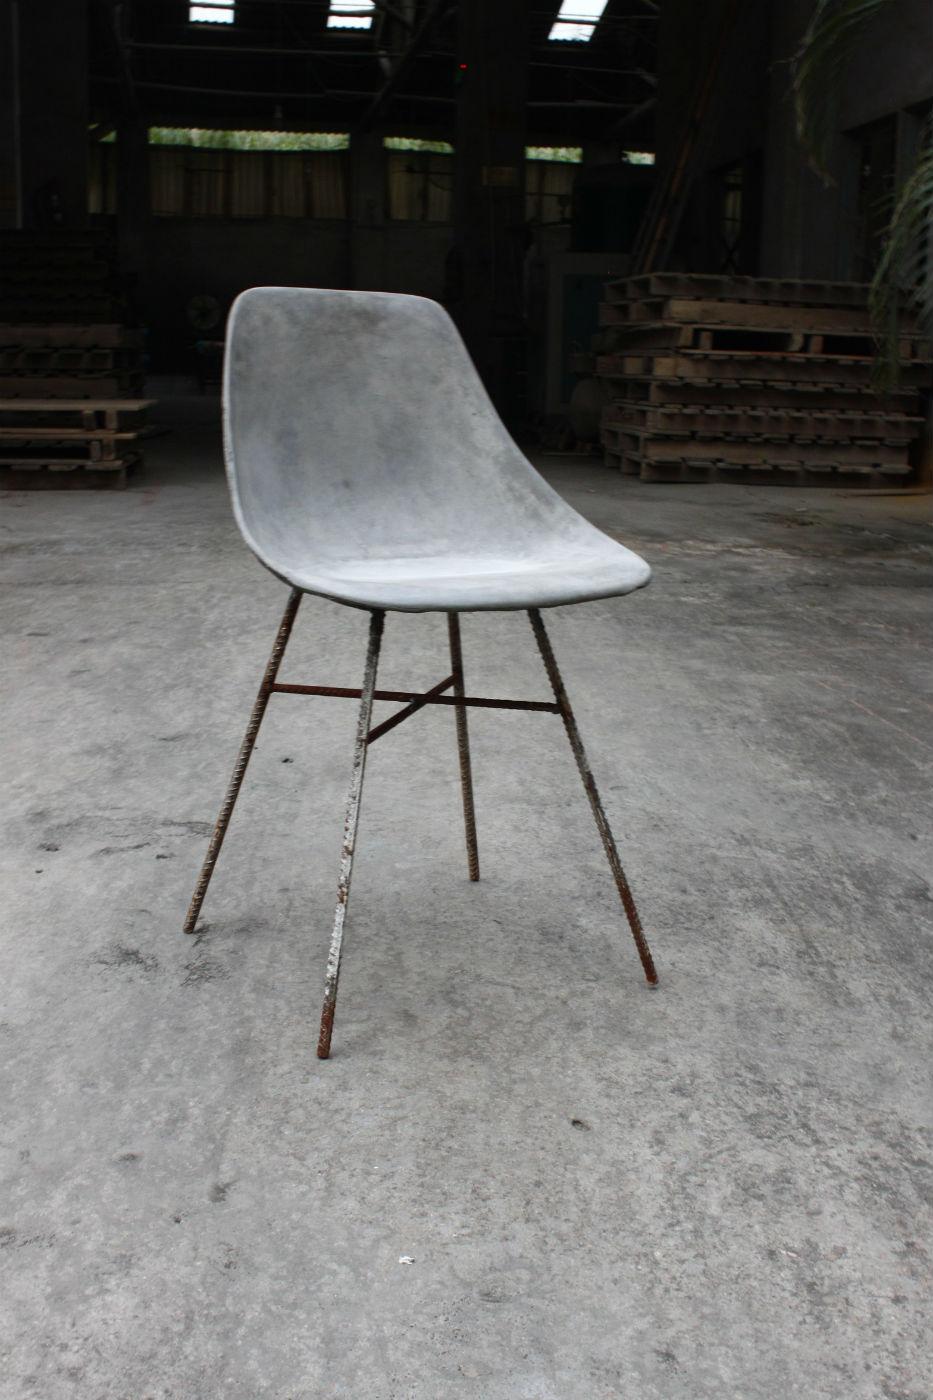 chaise-hauteville-beton-mobilier-outdoor